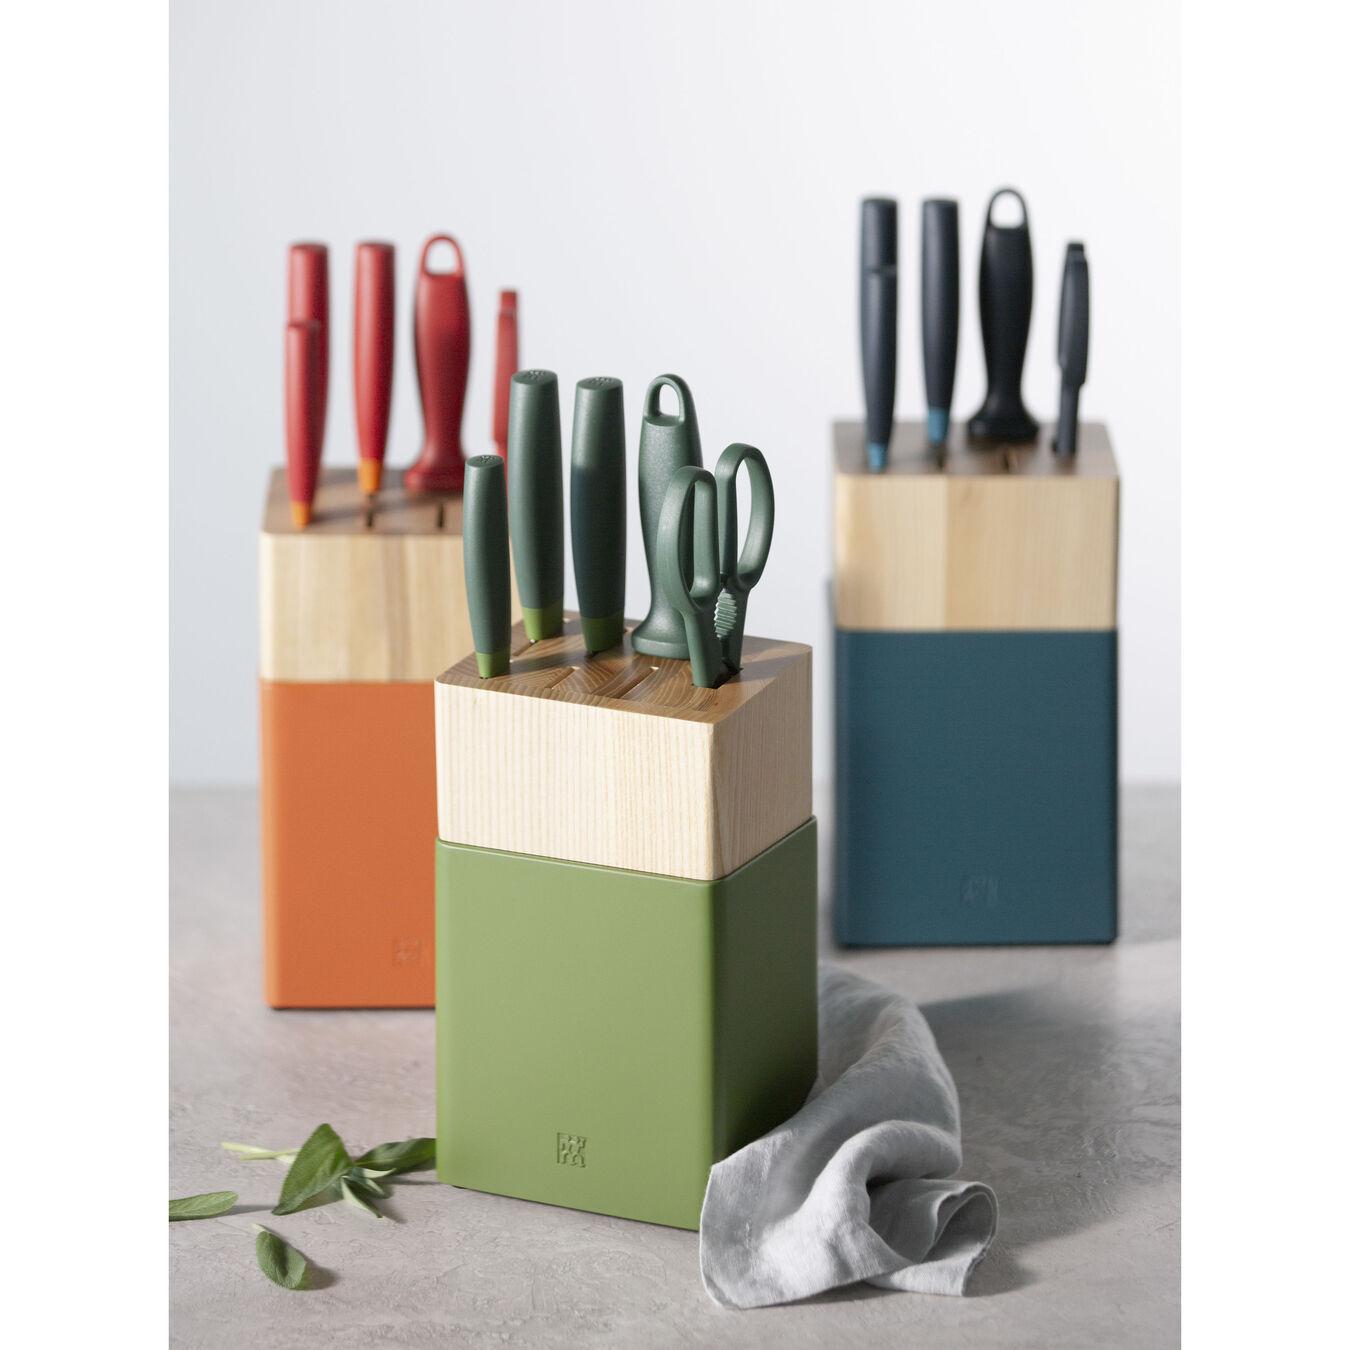 8-pc, Knife block set, lime green,,large 4